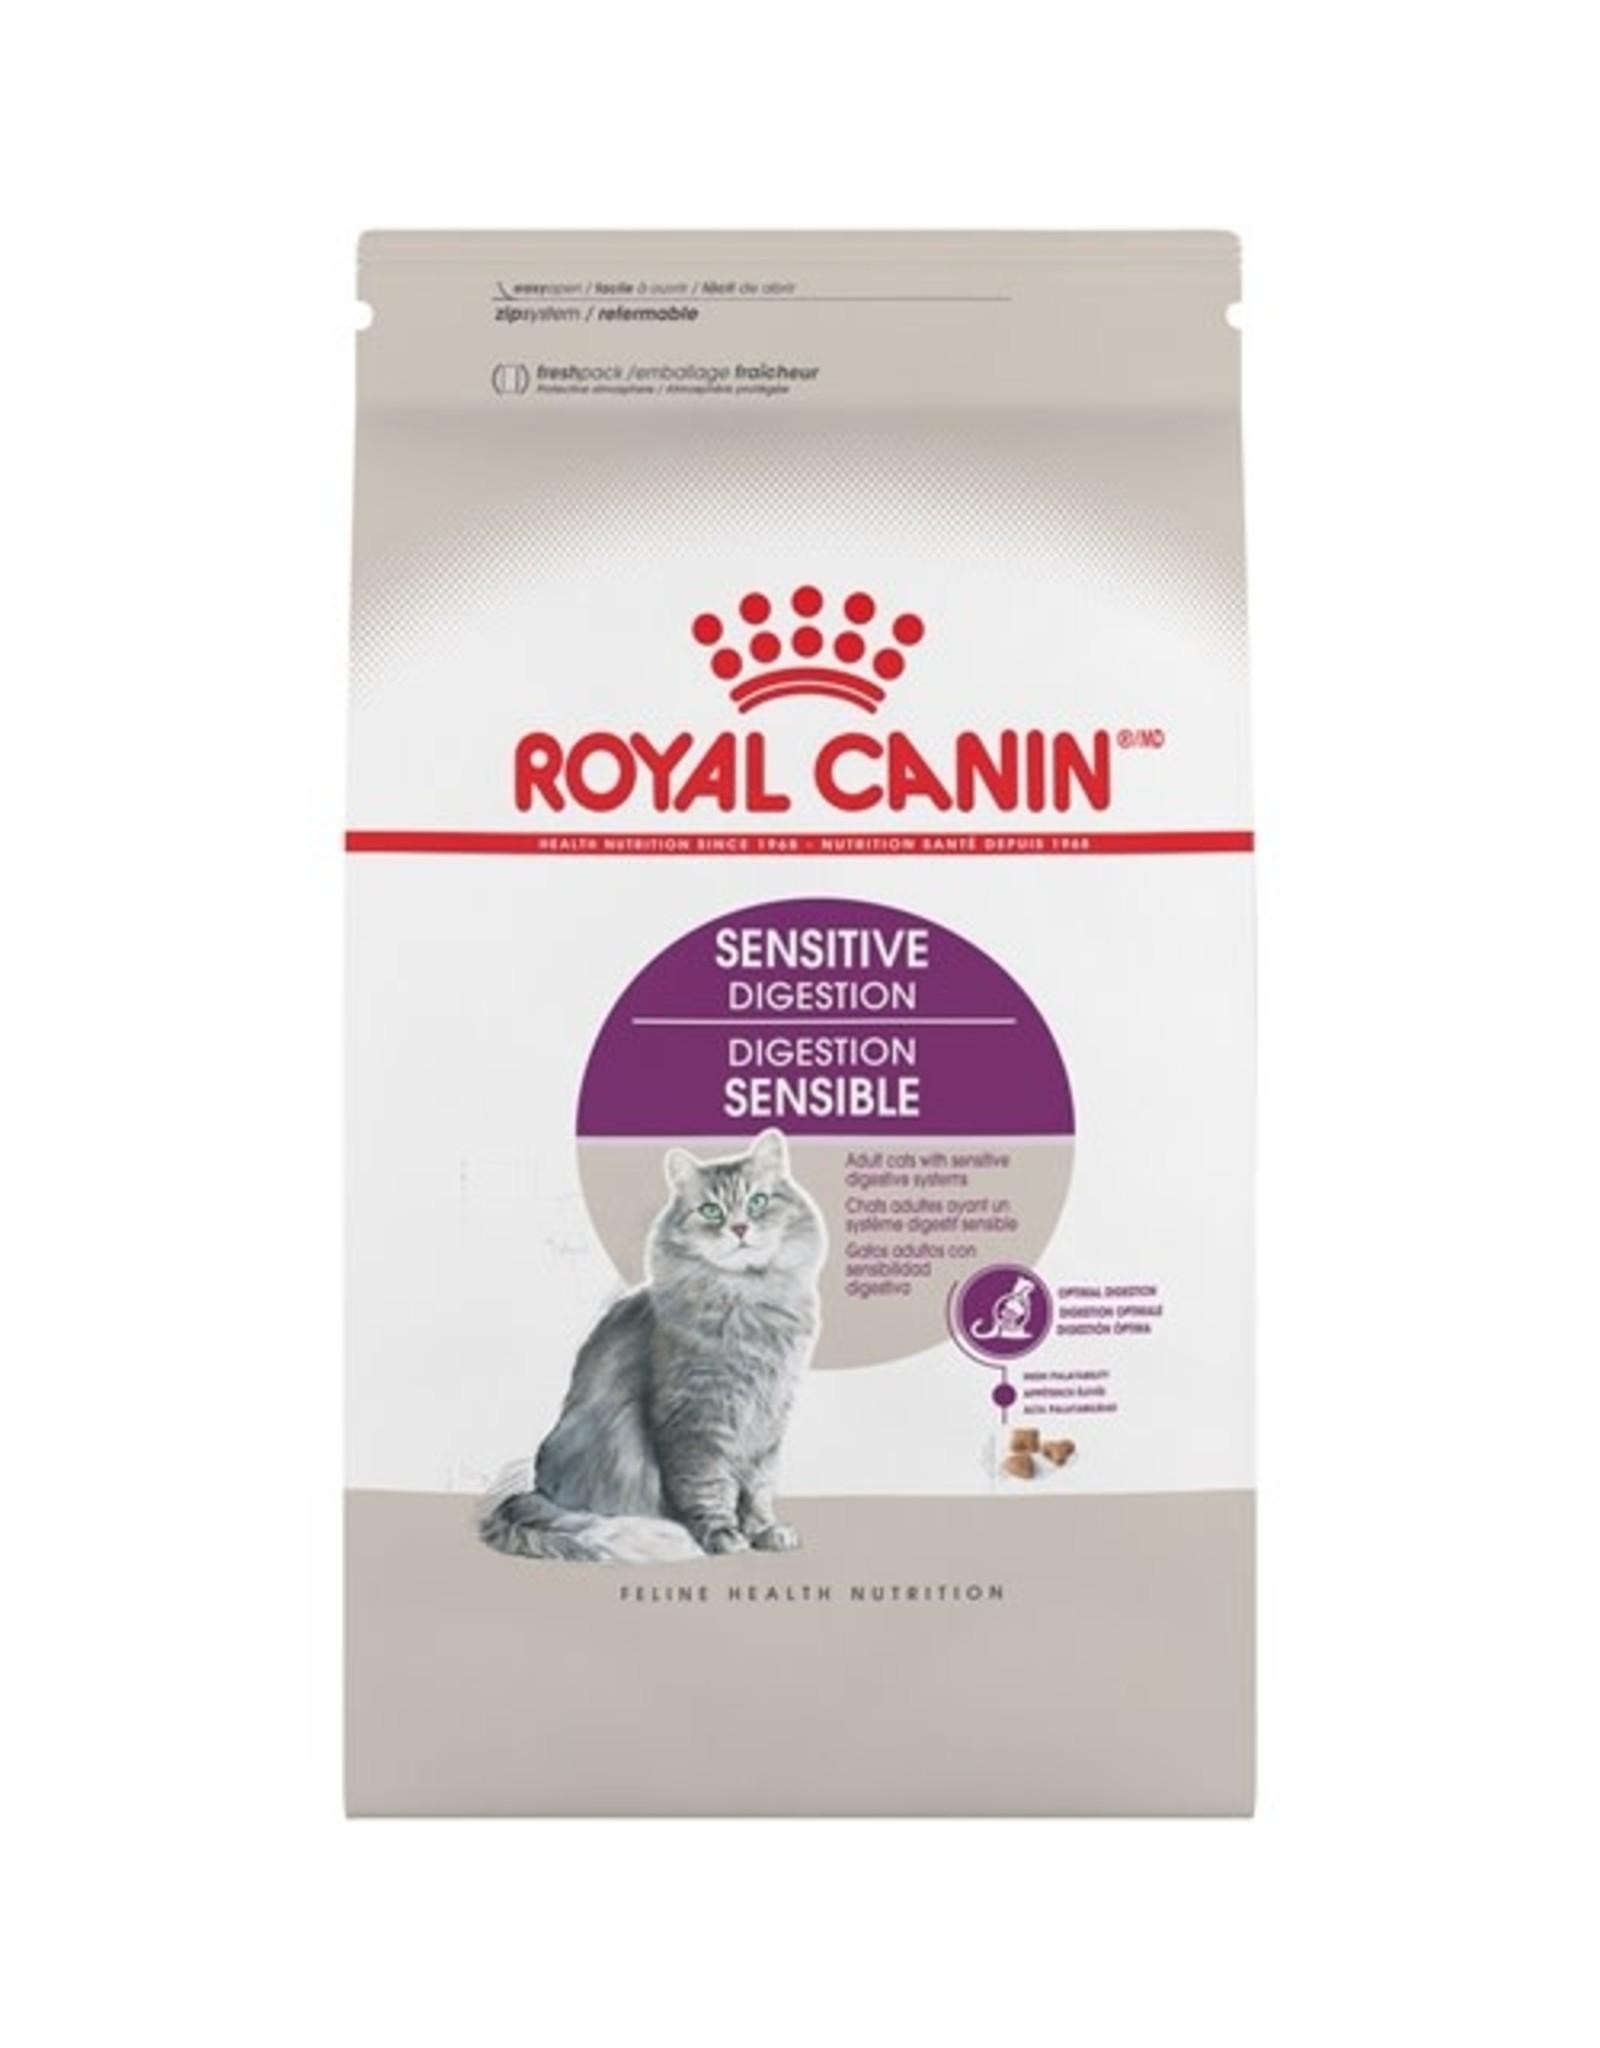 Royal Canin Royal Canin Sensitive Digestion 3.5 lb